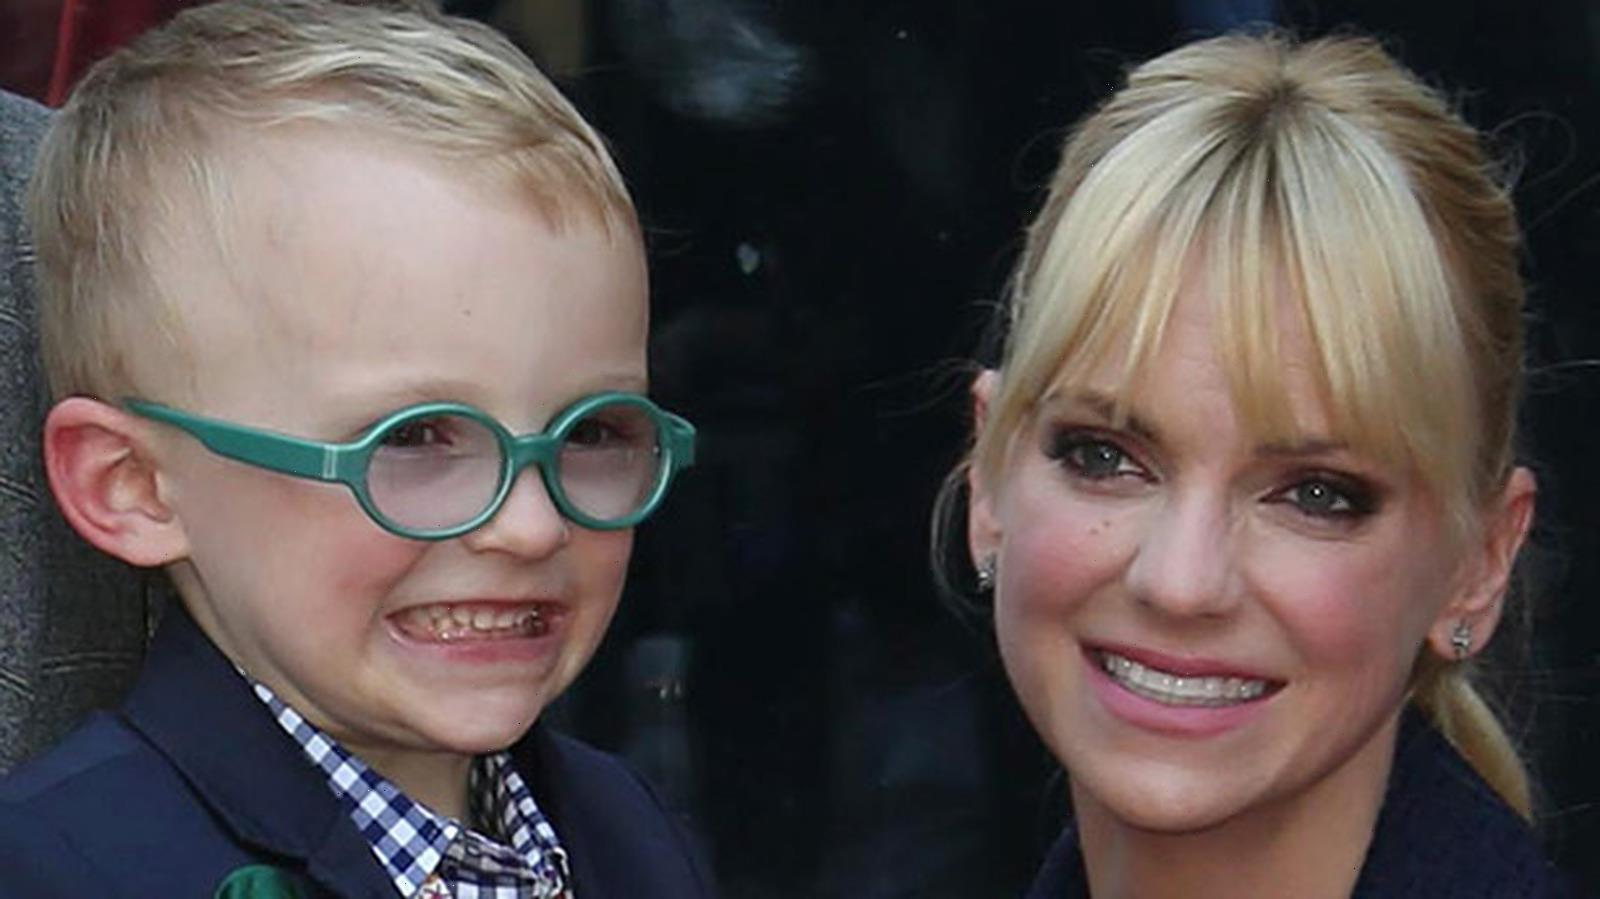 The Health Issues That Chris Pratt And Anna Faris' Son Faced As A Baby